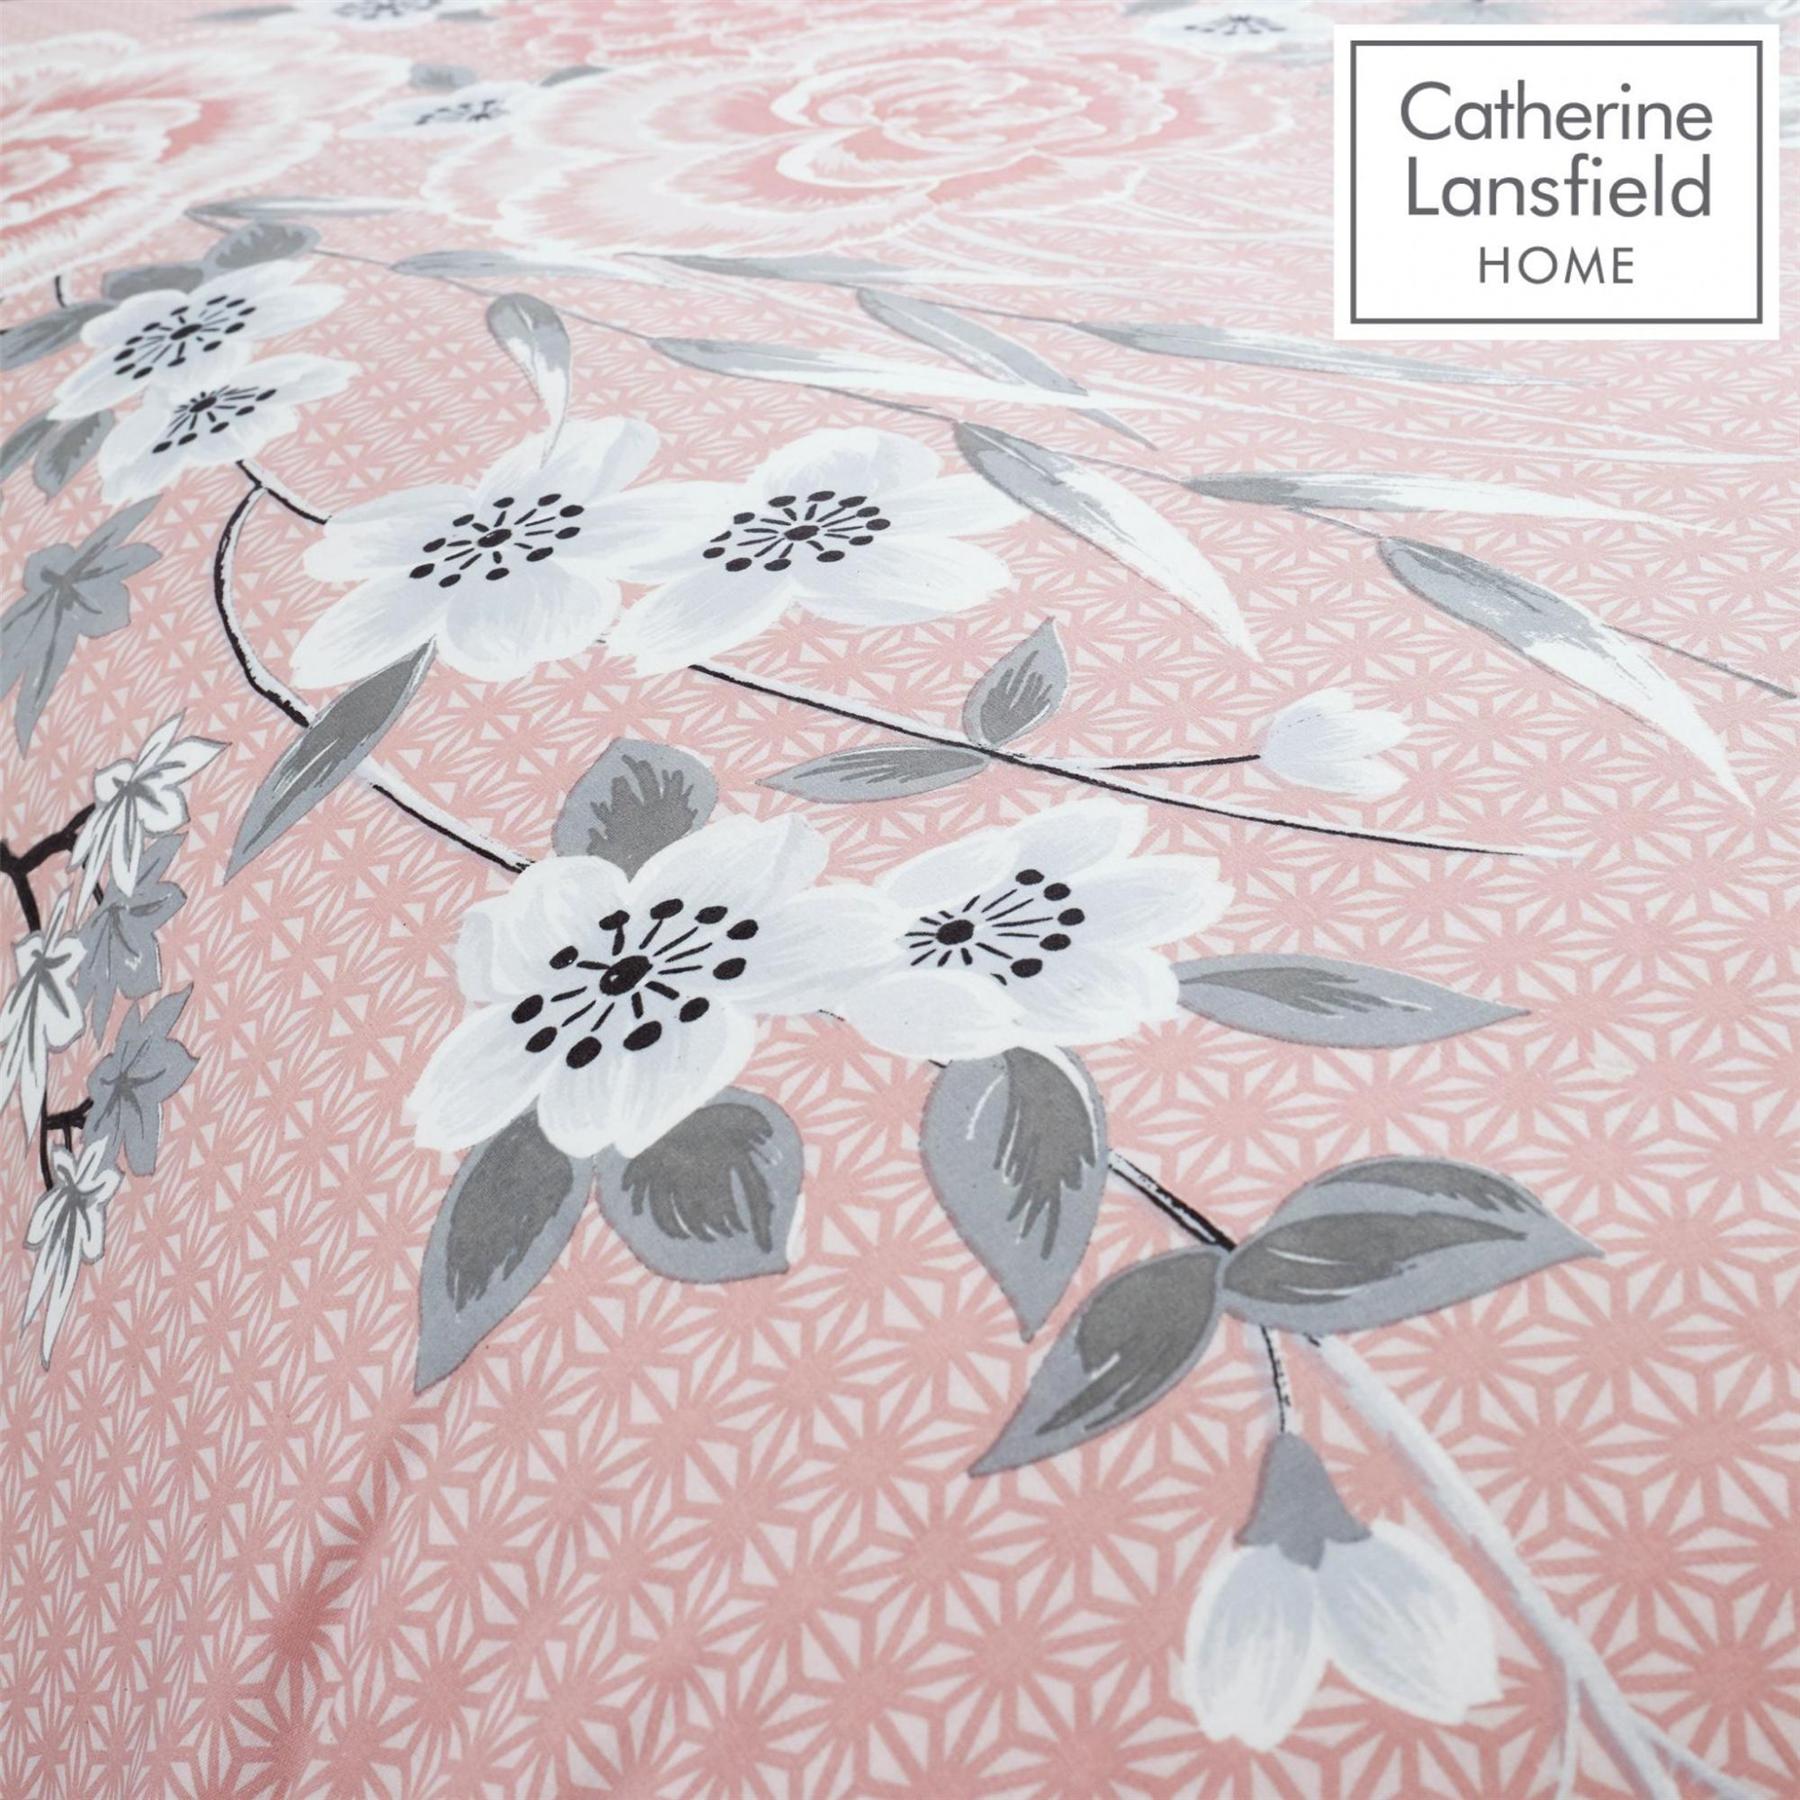 Catherine-Lansfield-Conjunto-de-Edredon-Reversible-oriental-en-Rosa-Ropa-De-Cama-Almohadas miniatura 5